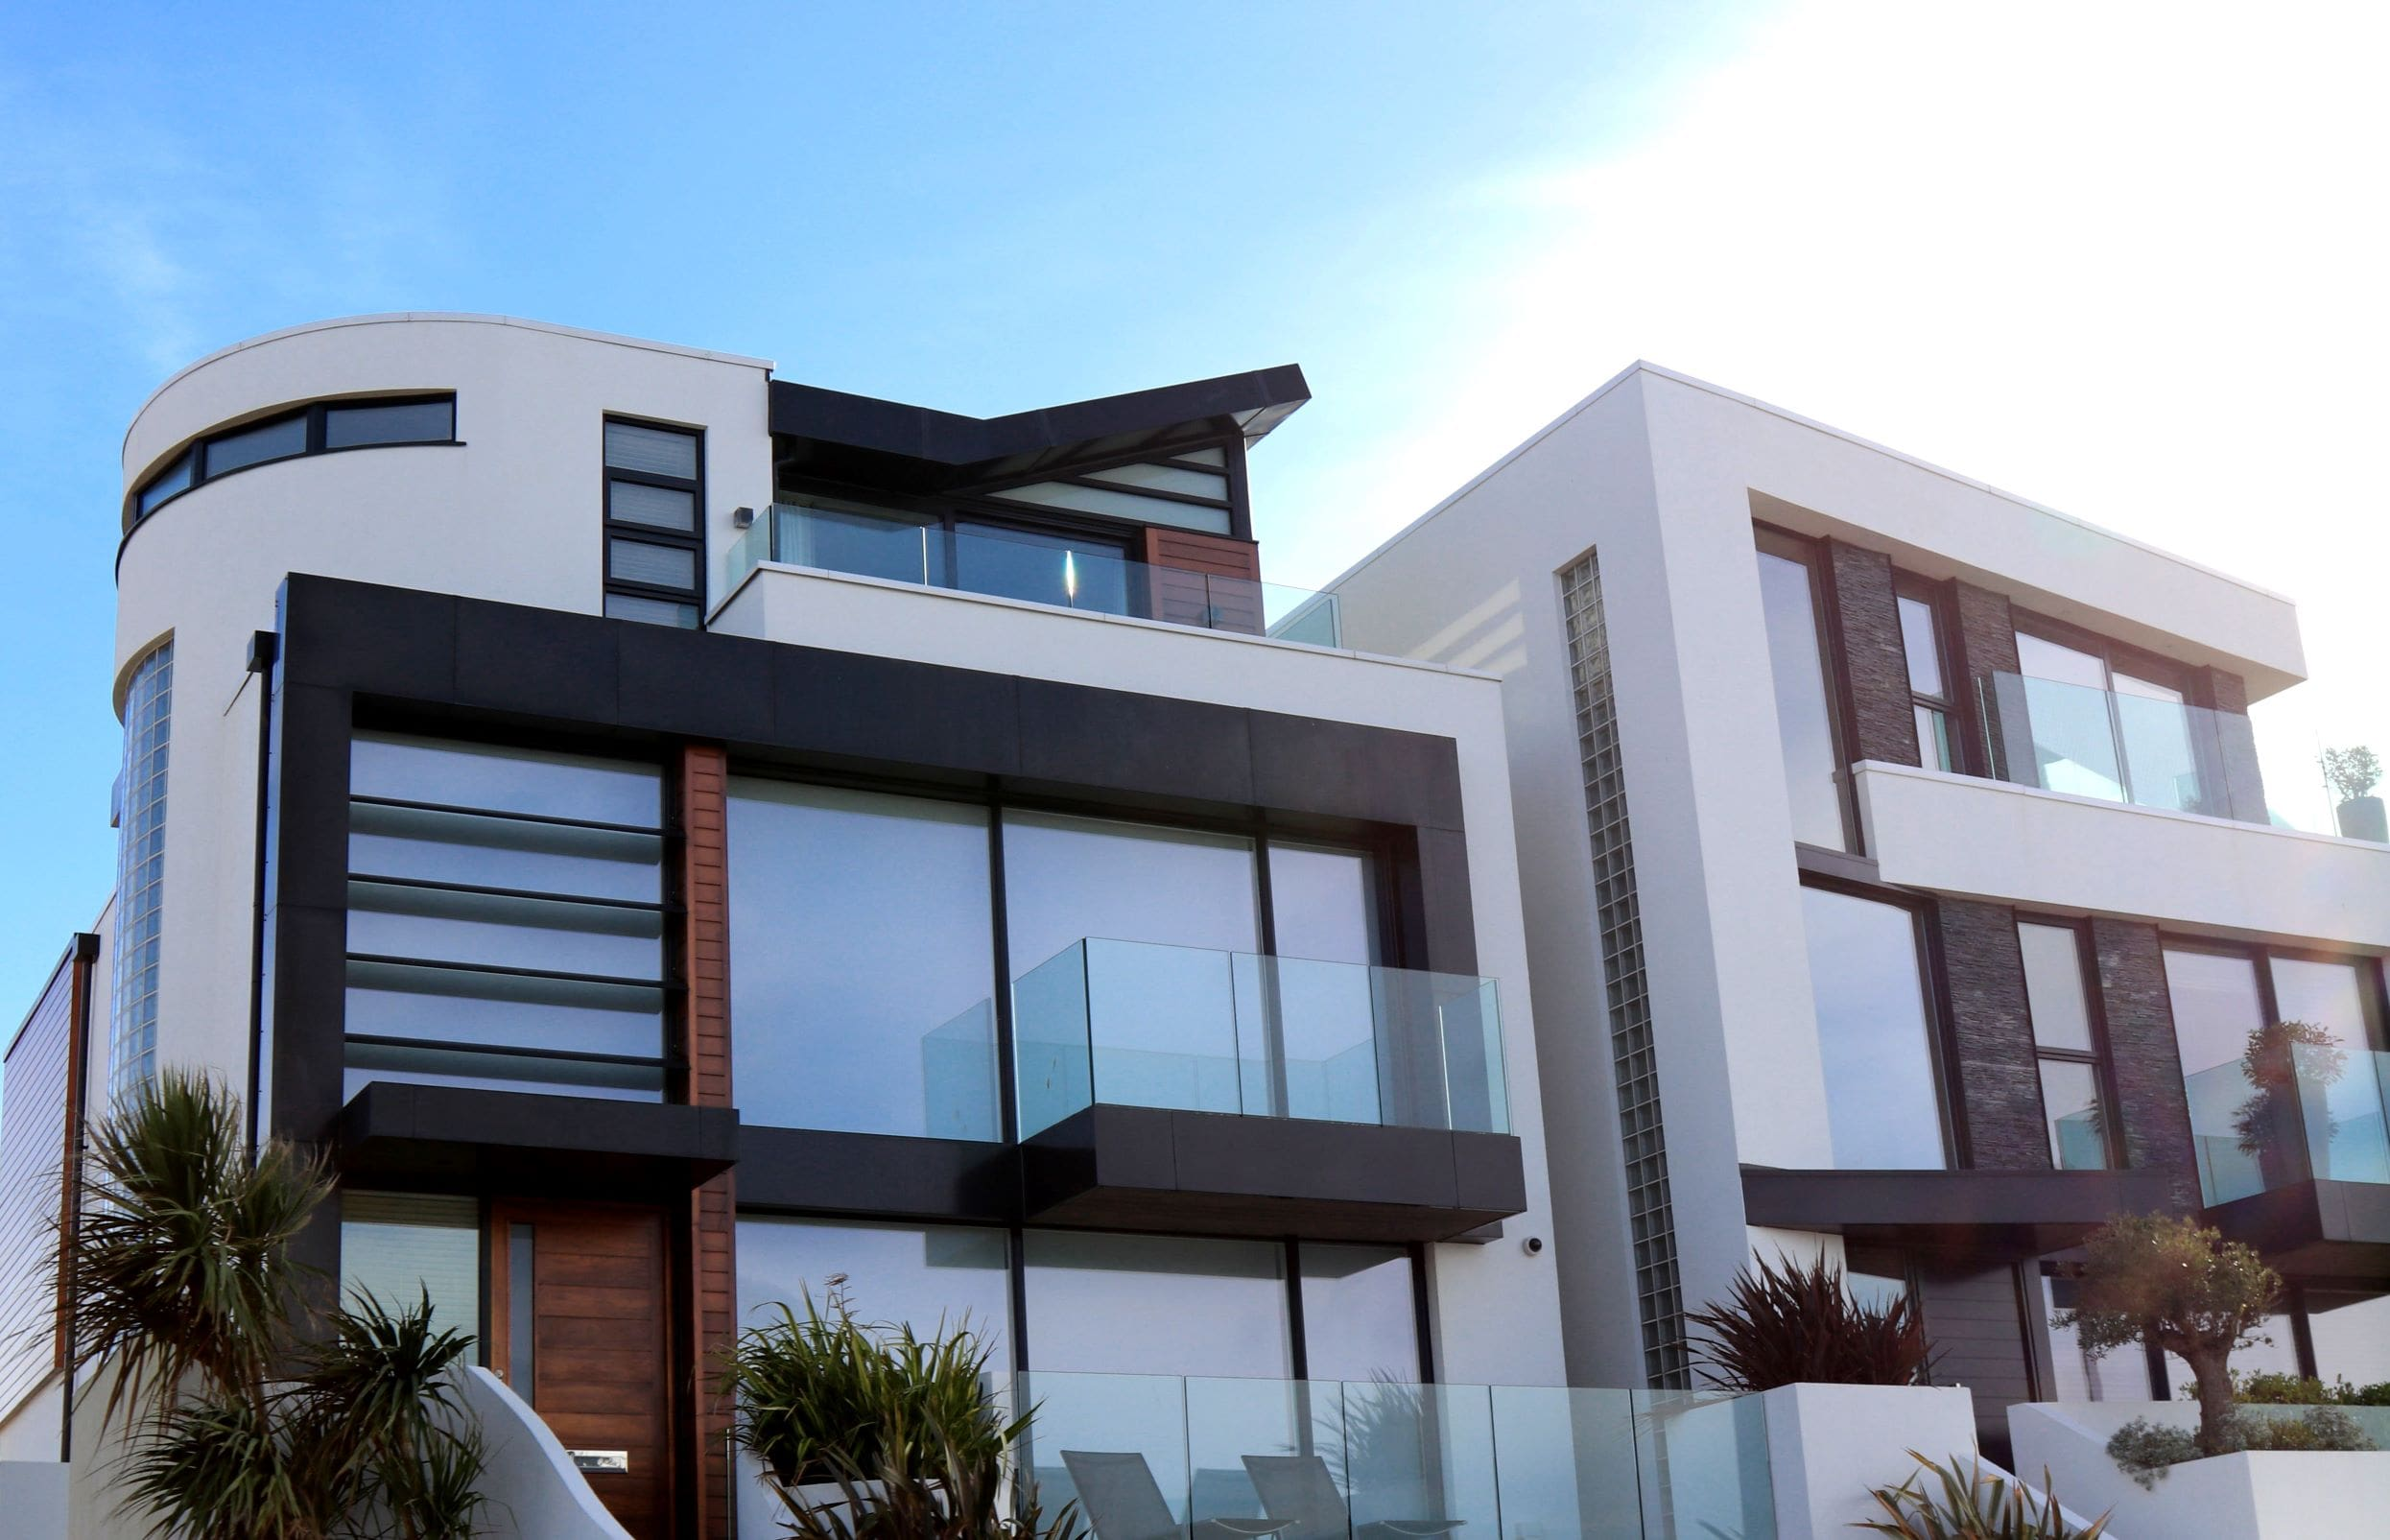 custom-glass-fences-rails-balustrades.jpg